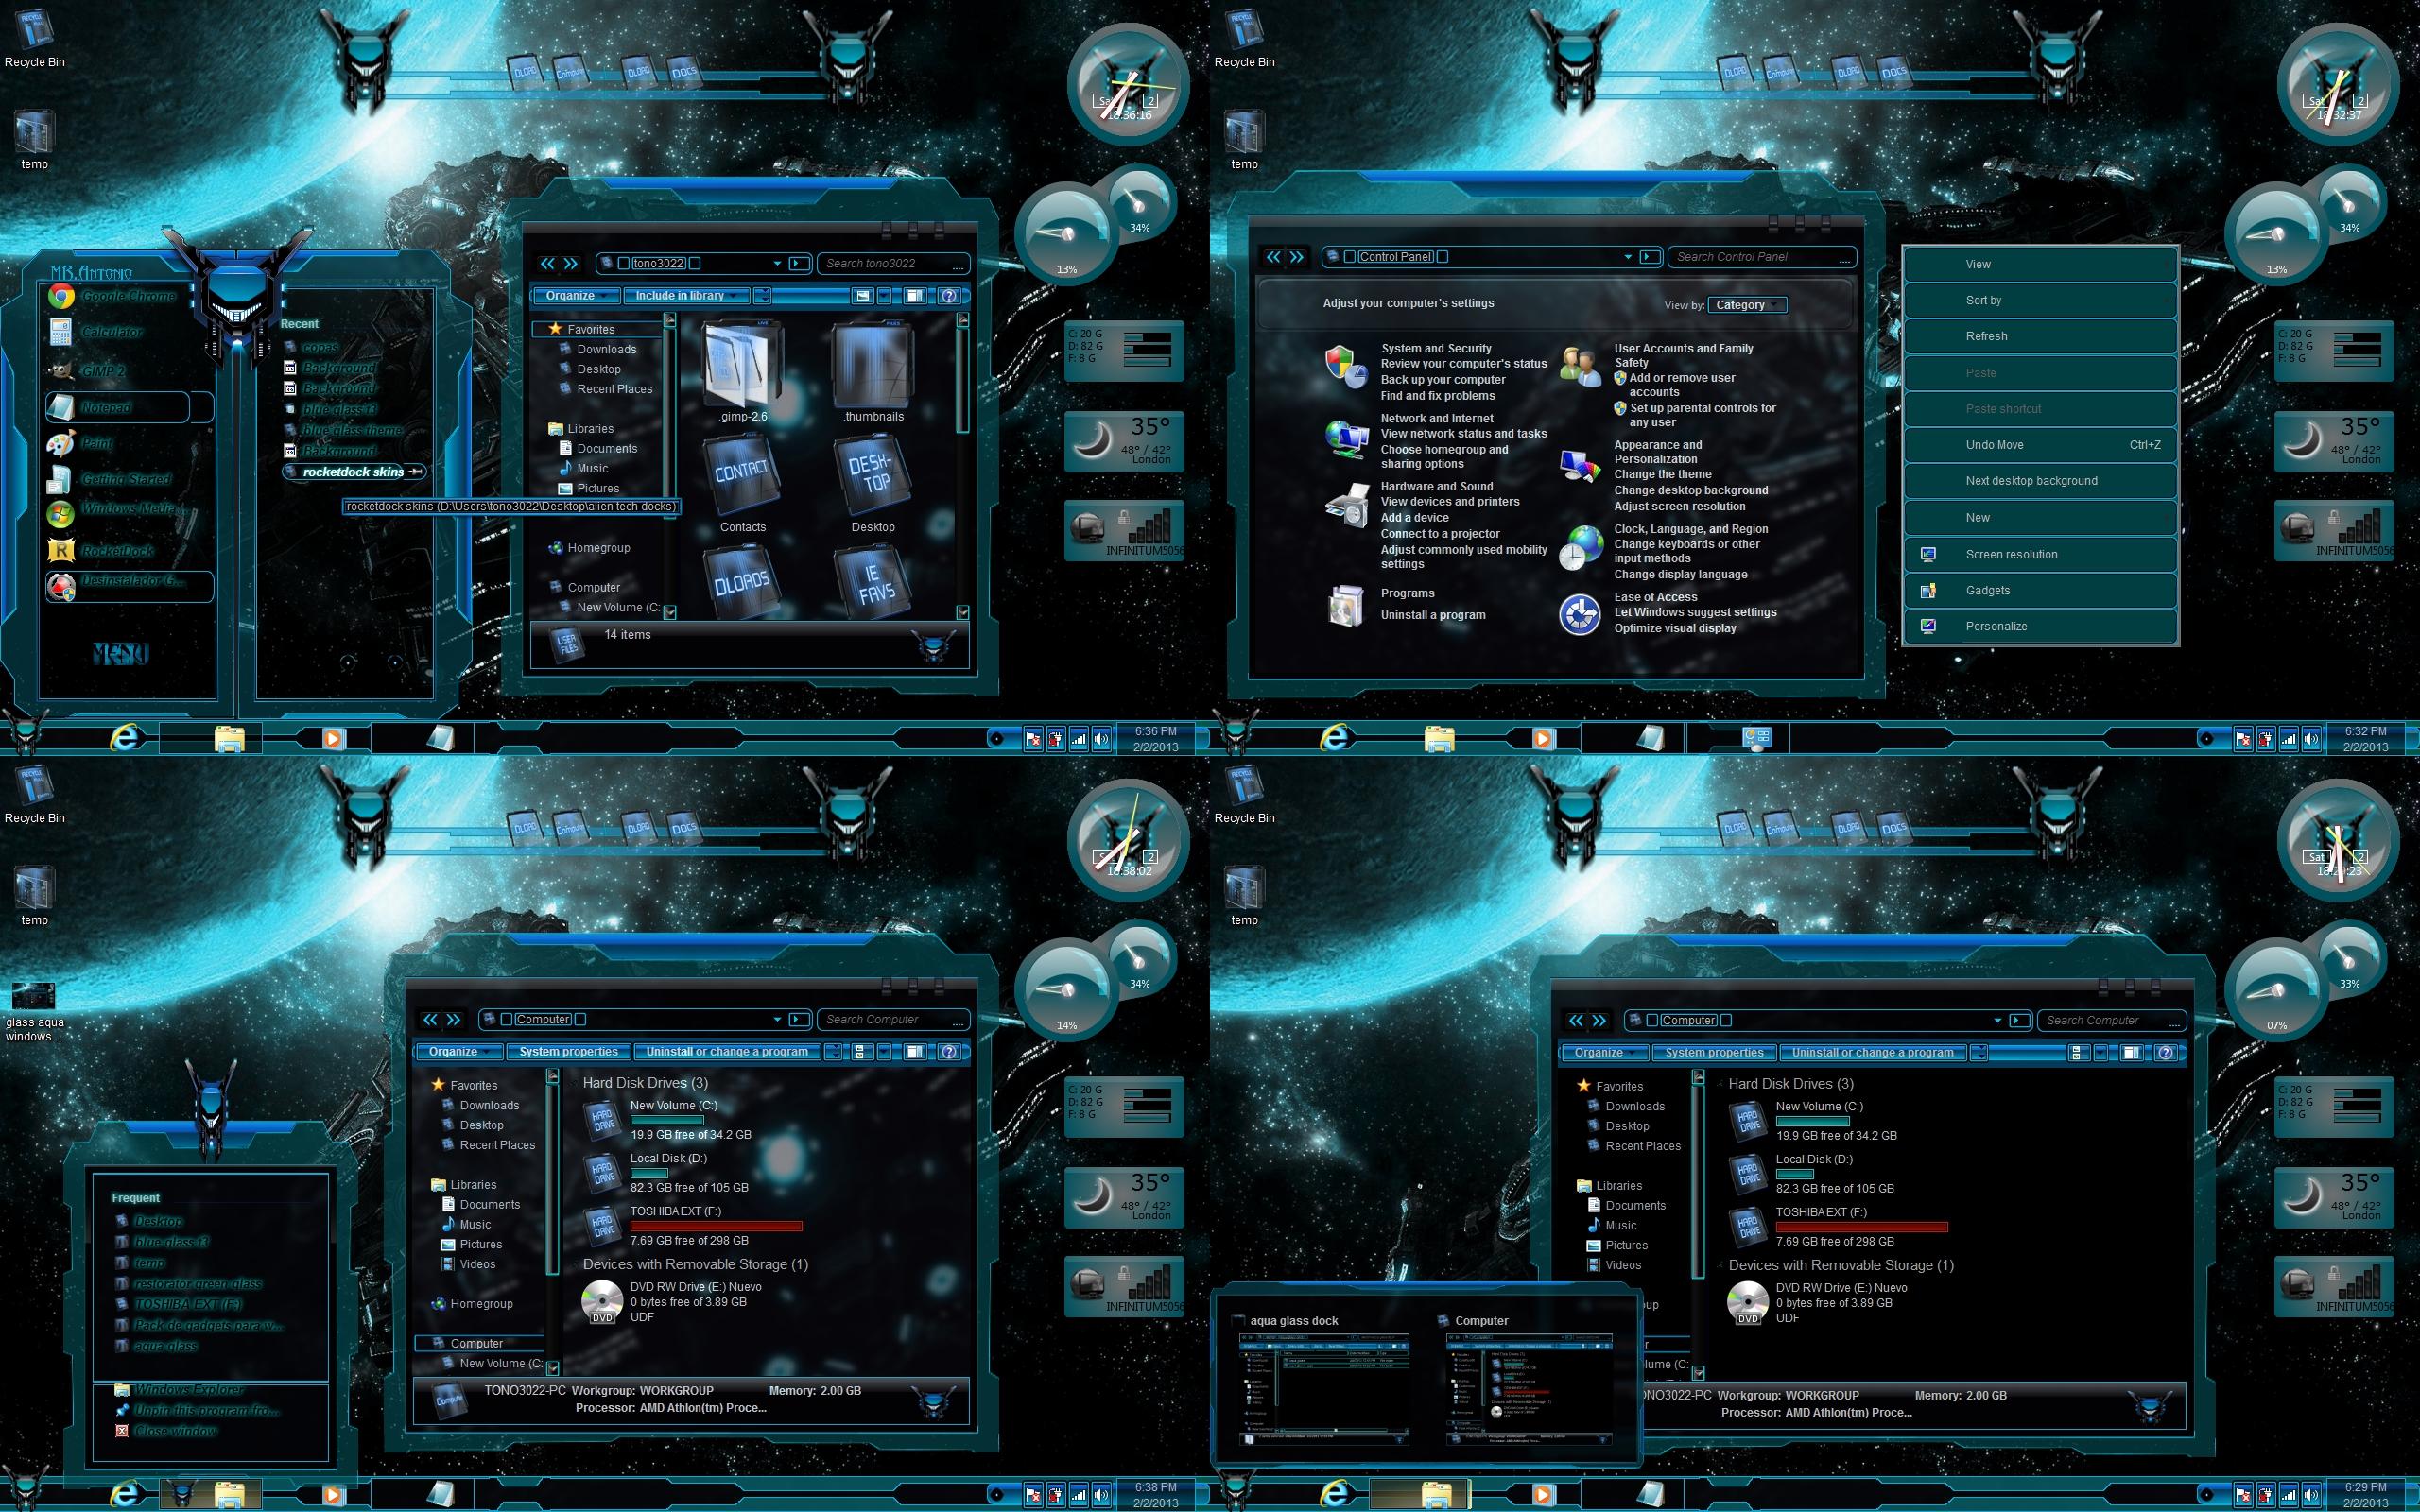 Glass aqua windows 7 themes by customizewin7 on deviantart for Window 07 themes